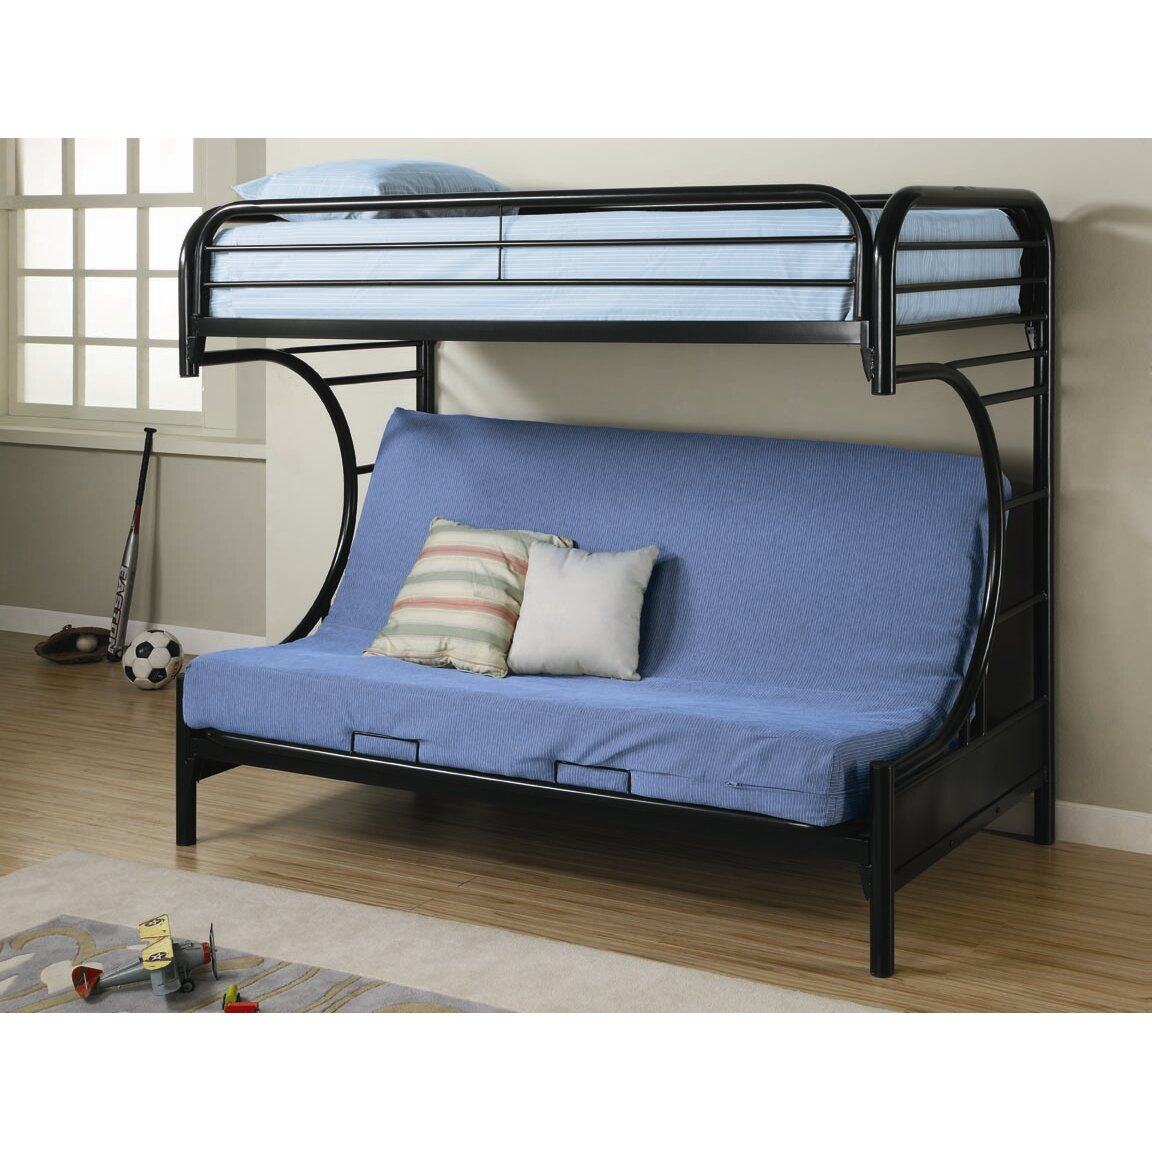 Washington twin over full bunk bed with trundle amp reviews wayfair - Wildon Home U0026reg Fall Creek Twin Over Full Futon Bunk Bed